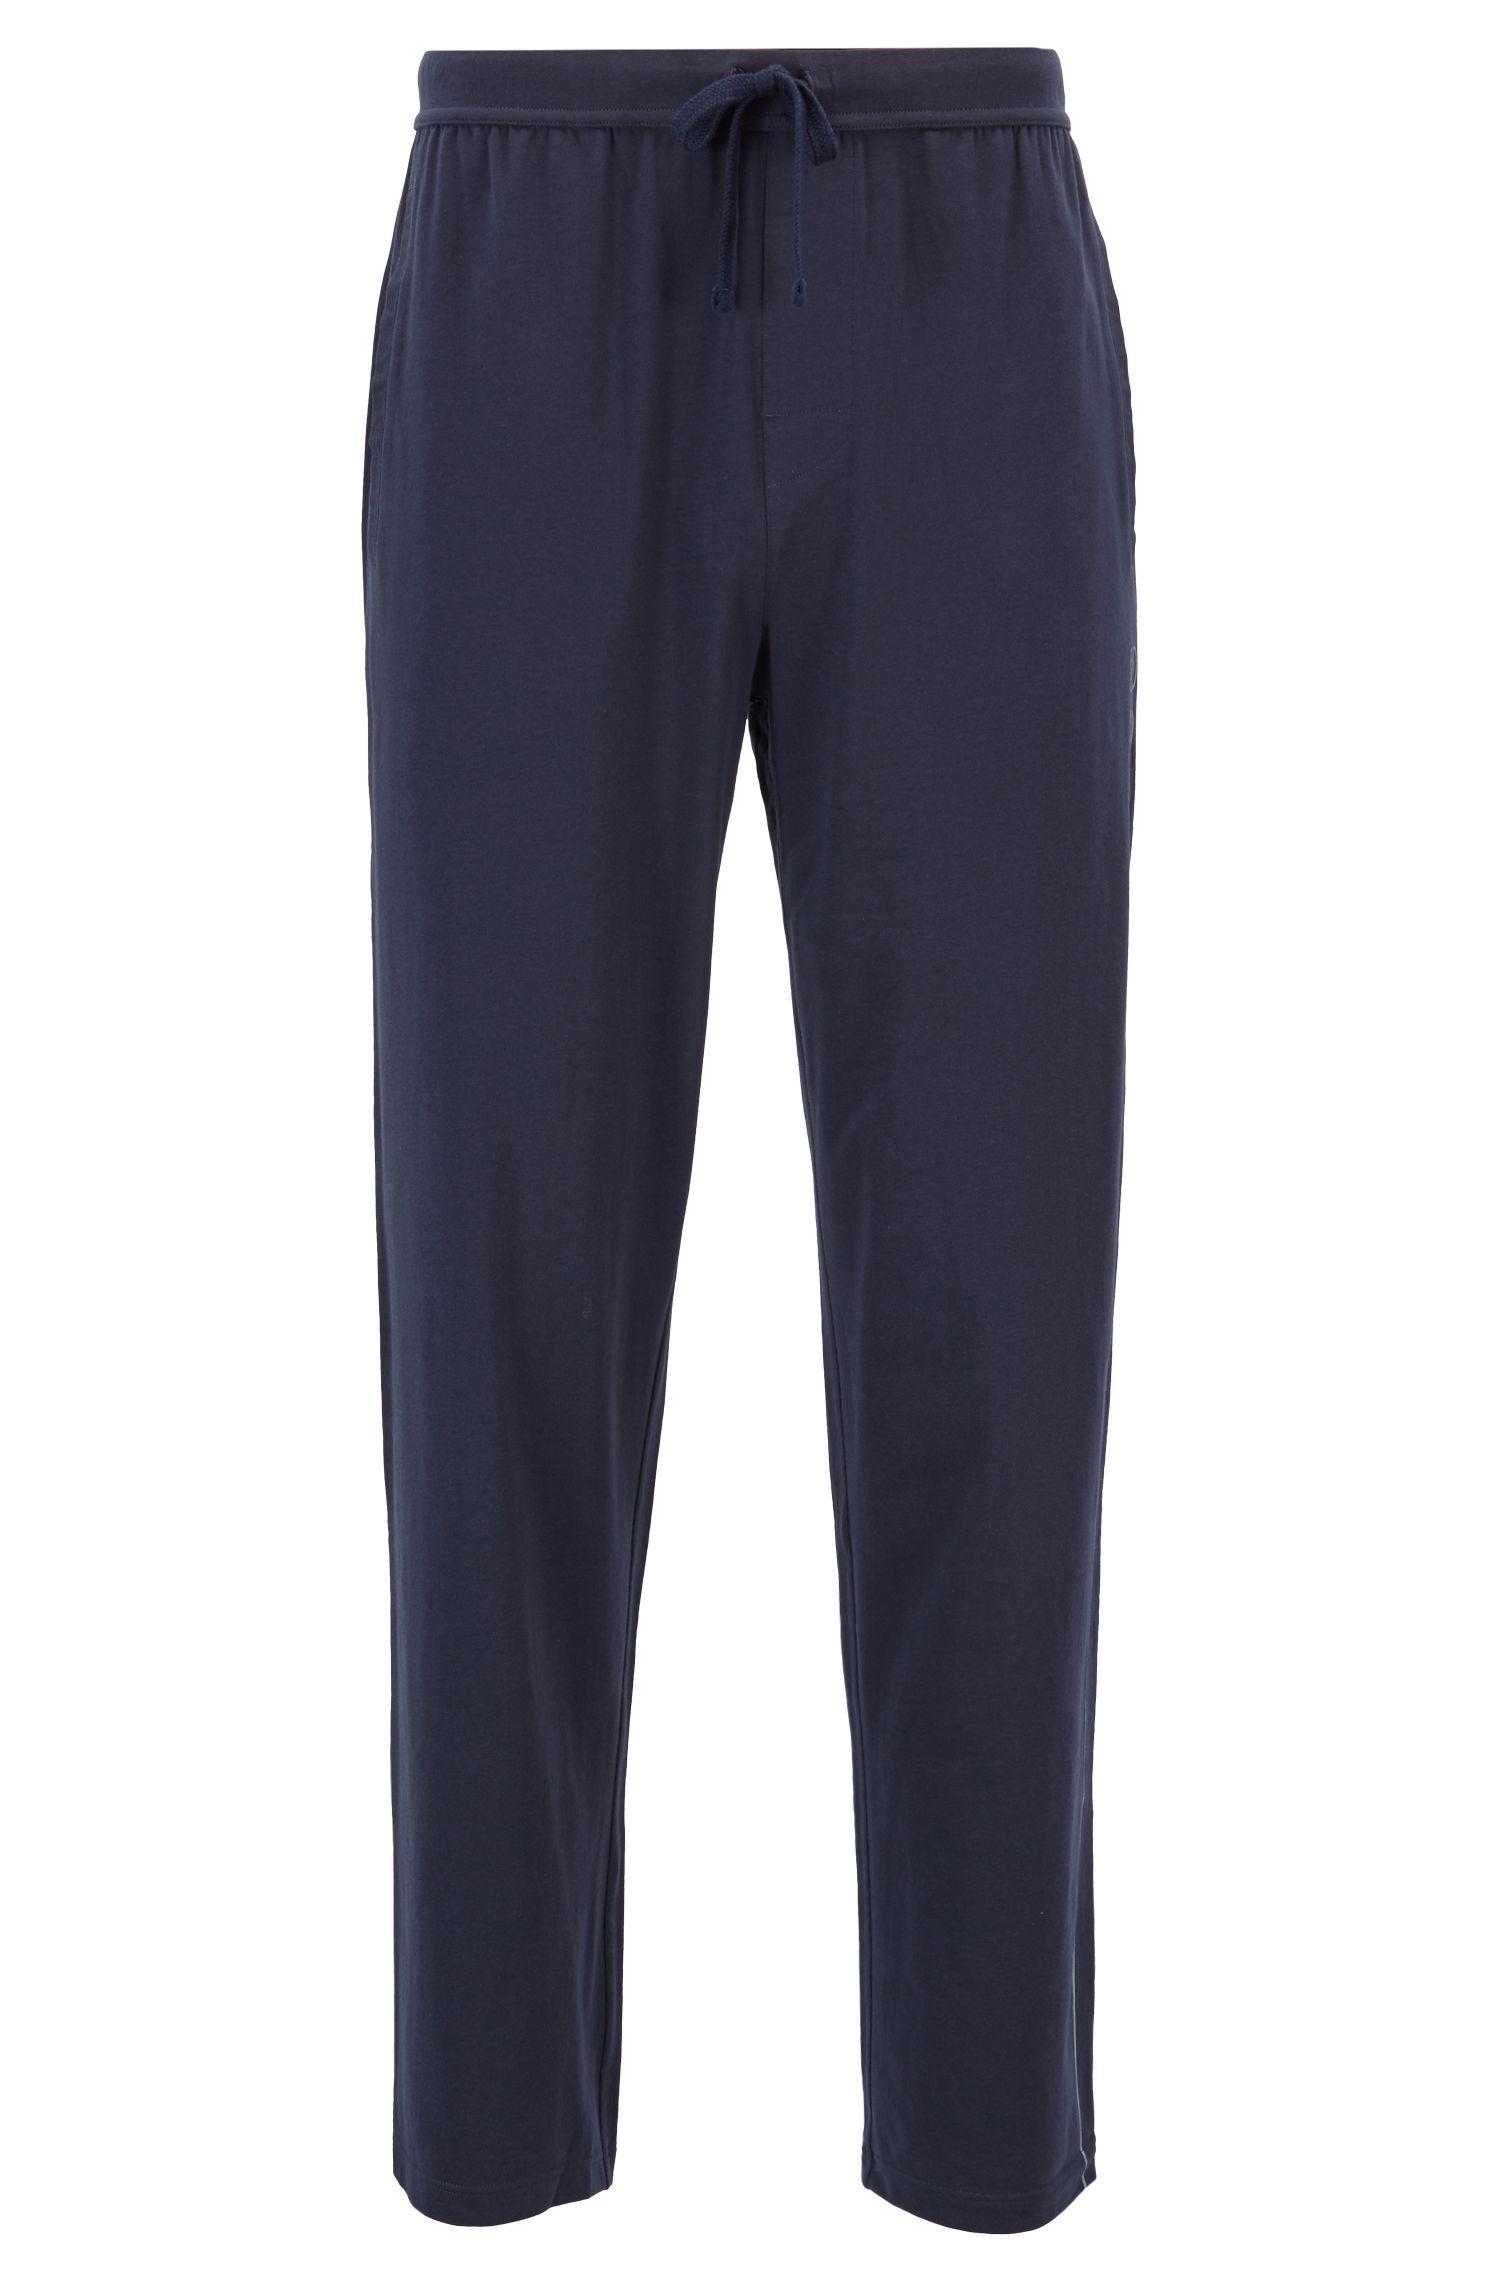 Stretch-jersey pajama bottoms with side logo print, Dark Blue